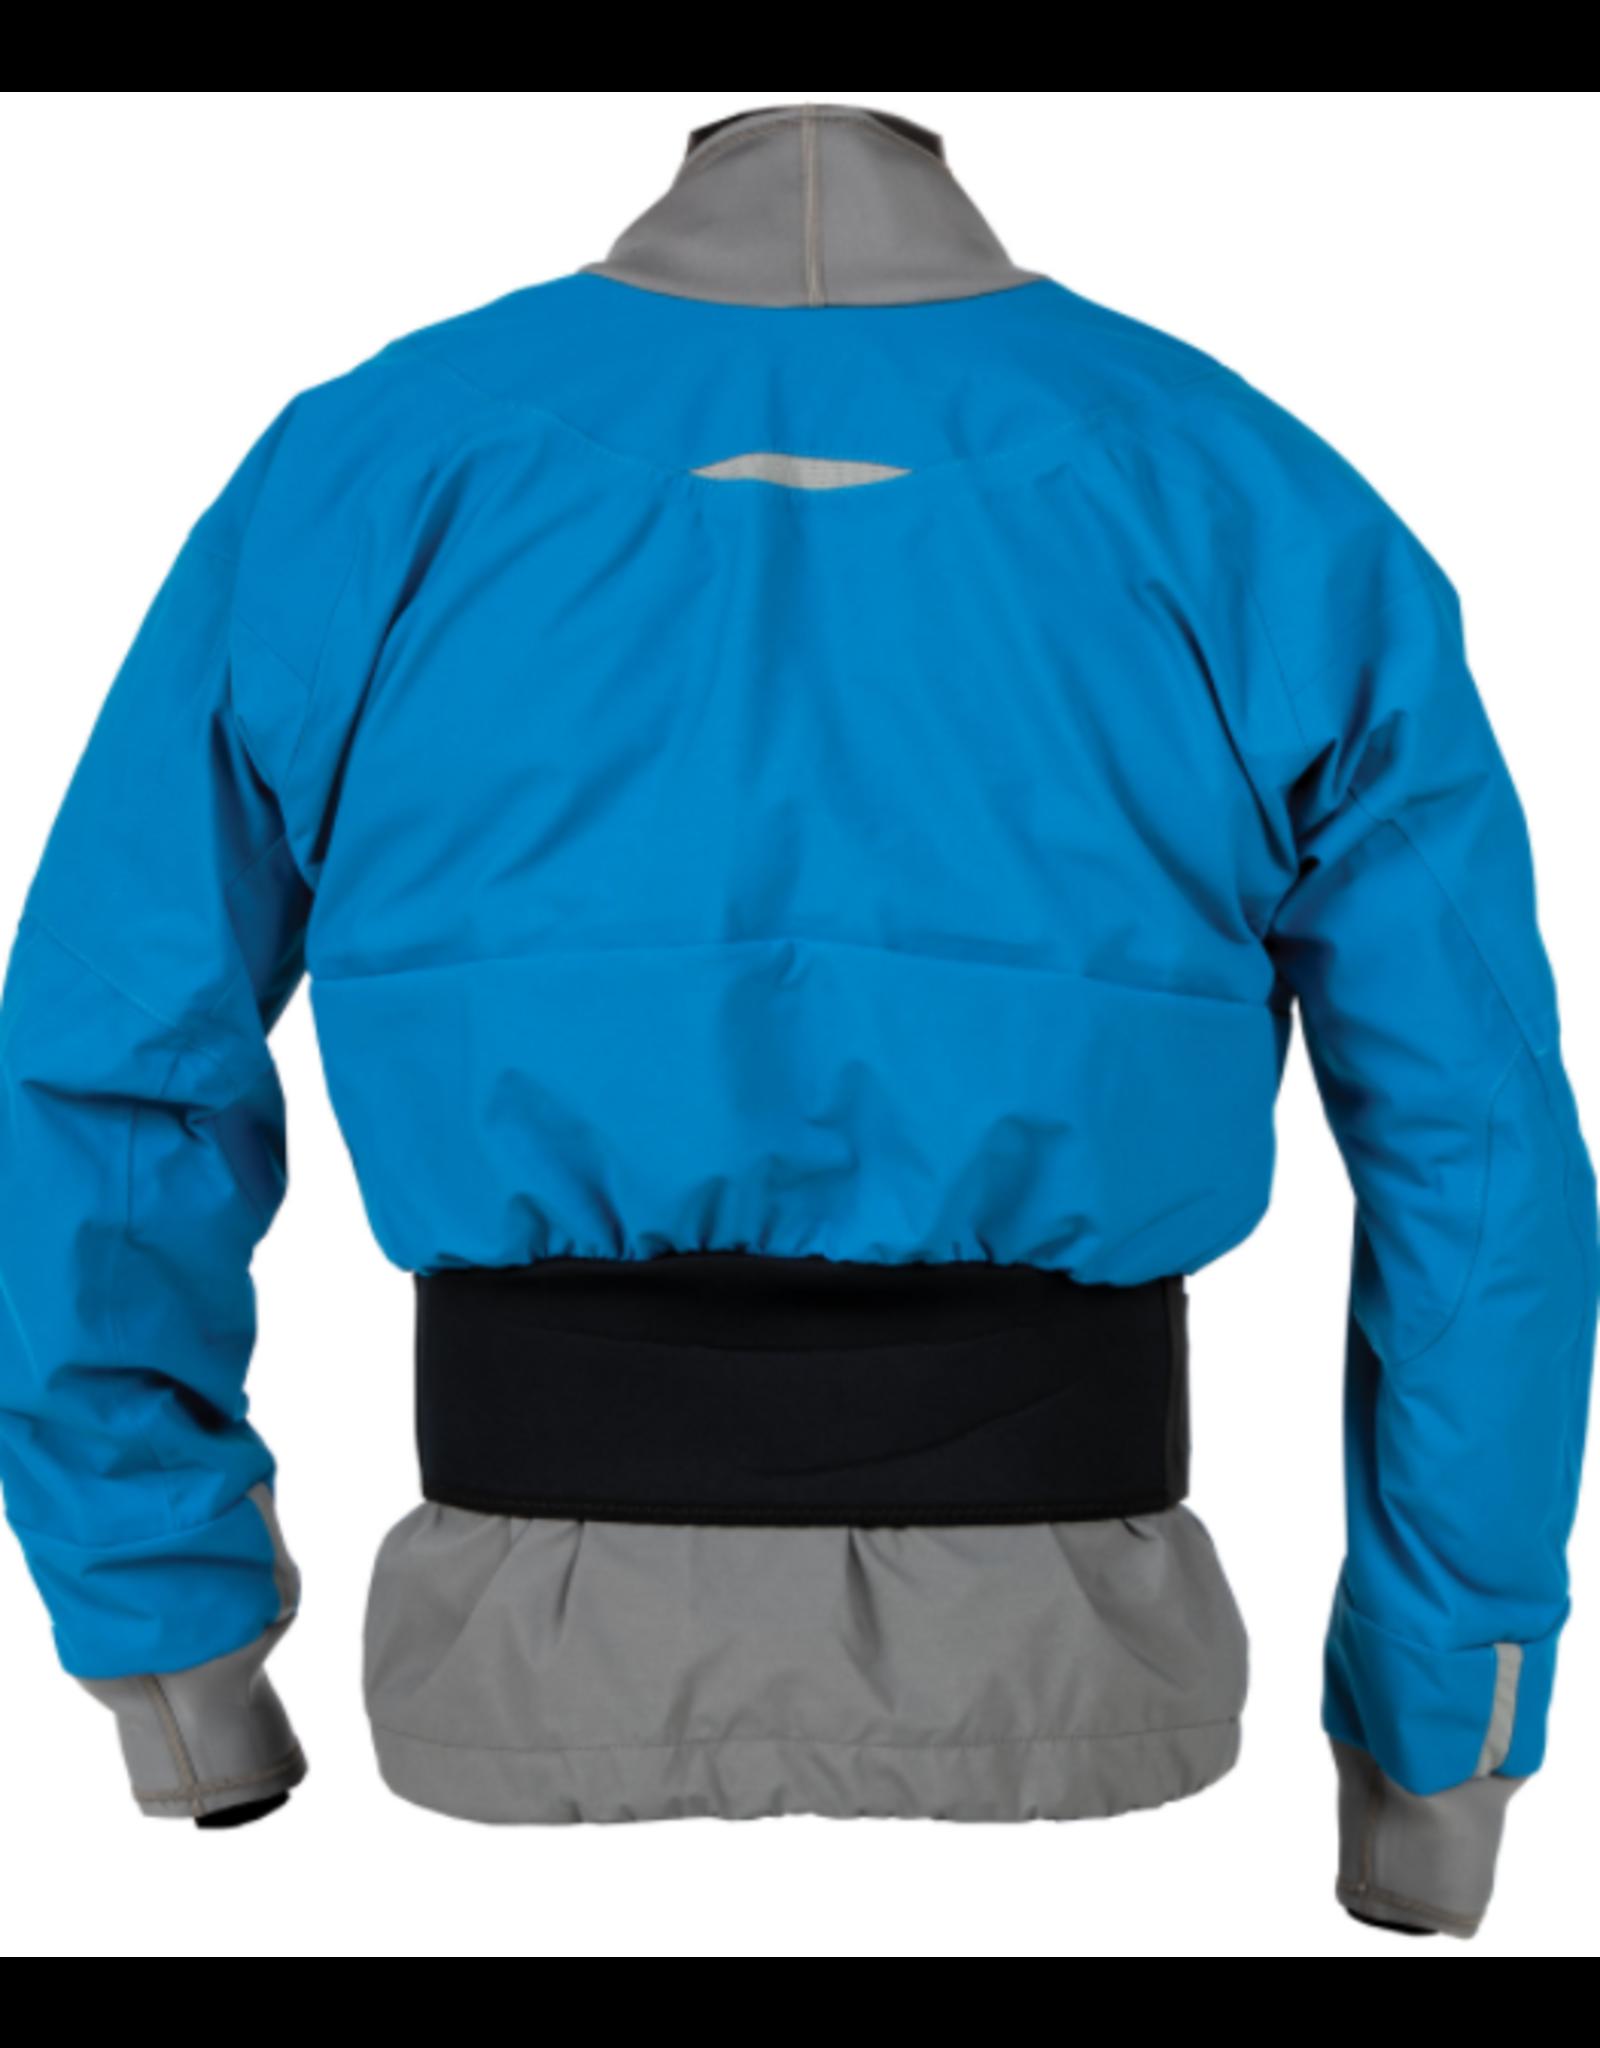 Kokatat Kokatat OM Gore-tex Pro Drytop